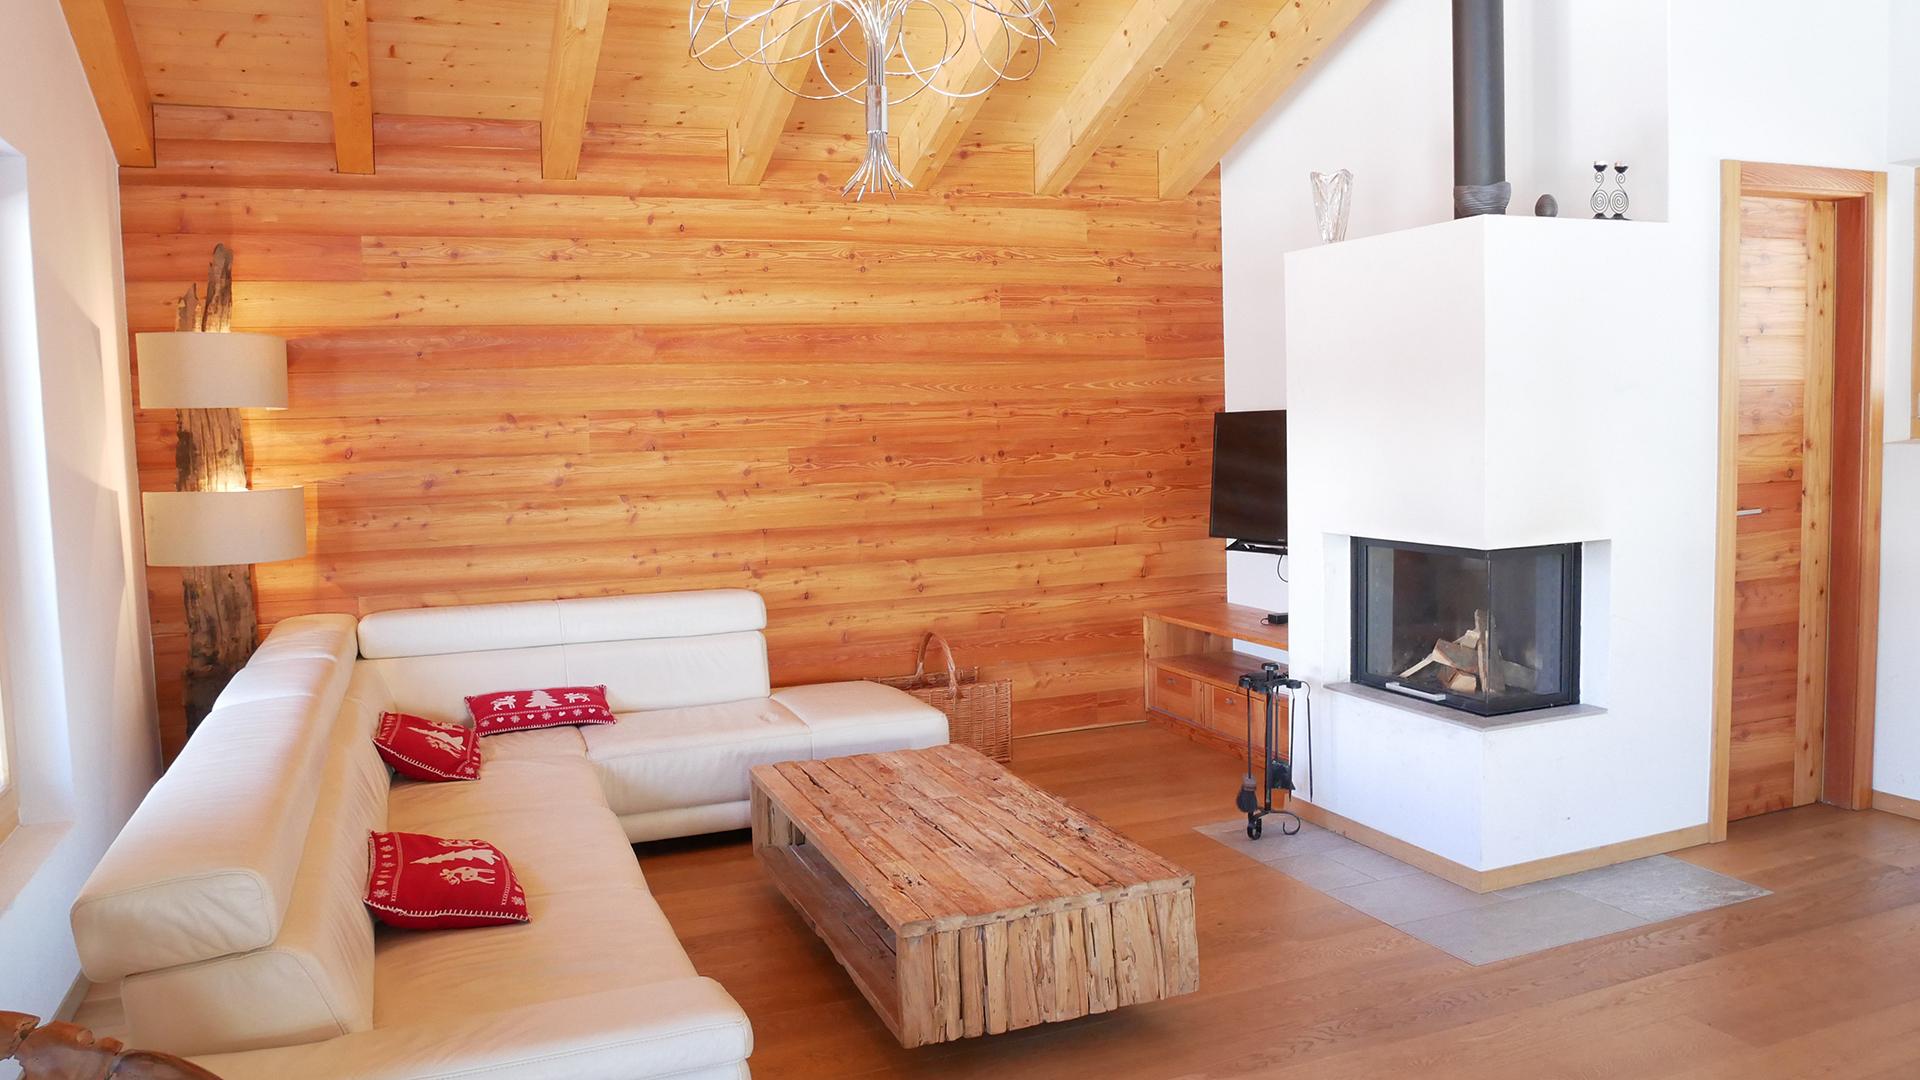 Chalet Pic Blanc Chalet, Switzerland